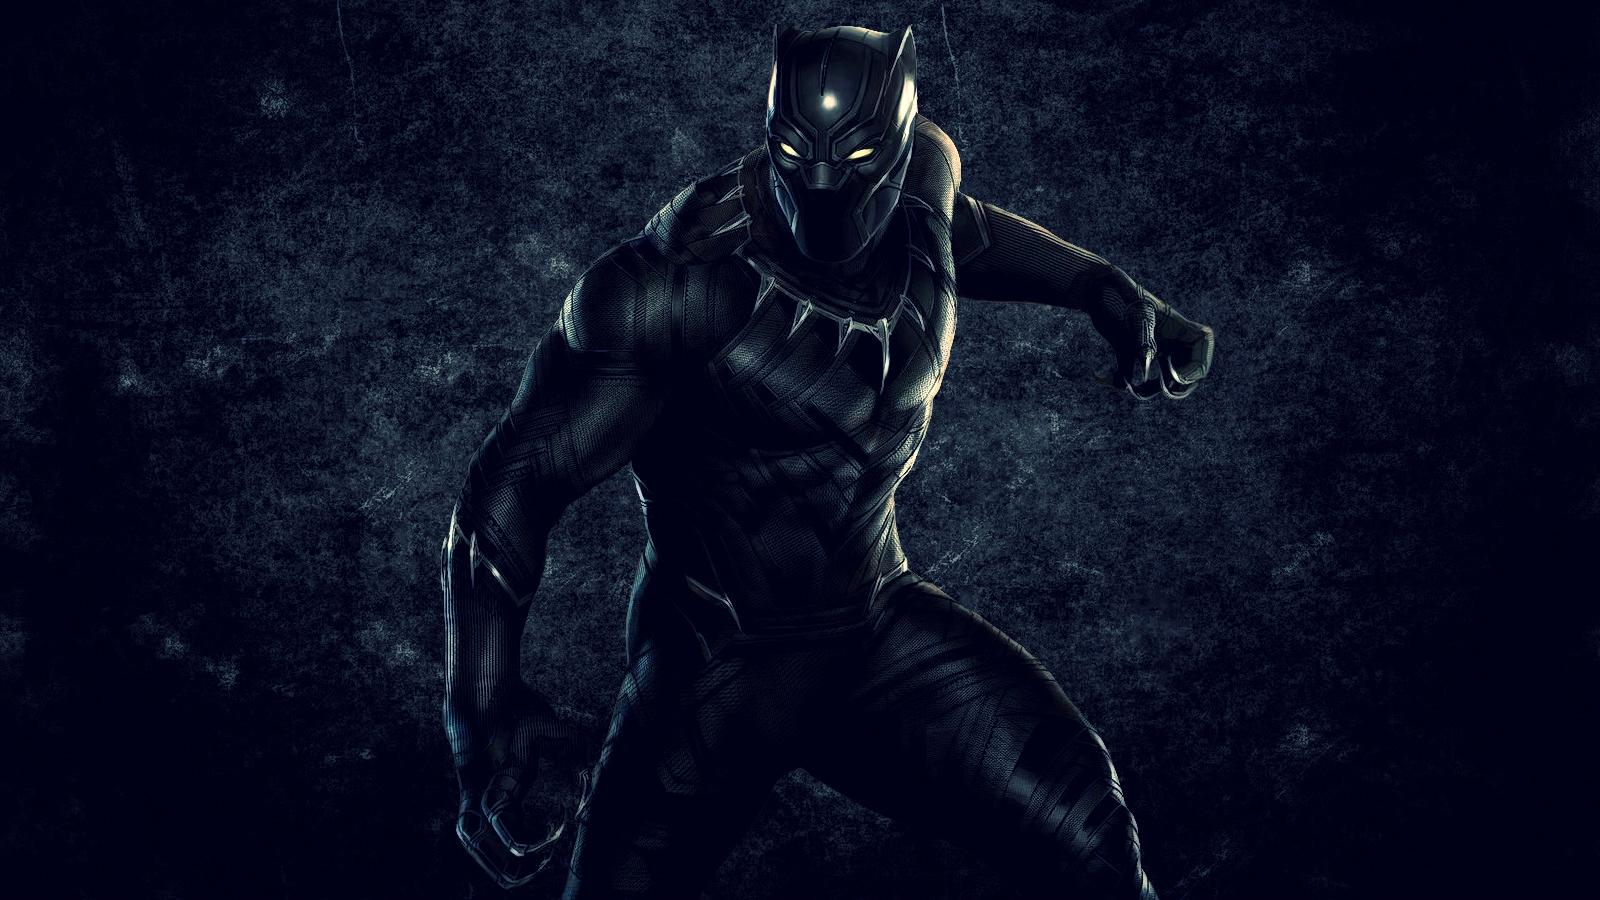 Free Download Black Panther Wallpaper By Franky4fingersx2 1600x900 For Your Desktop Mobile Tablet Explore 96 Wakanda Wallpapers Wakanda Wallpapers